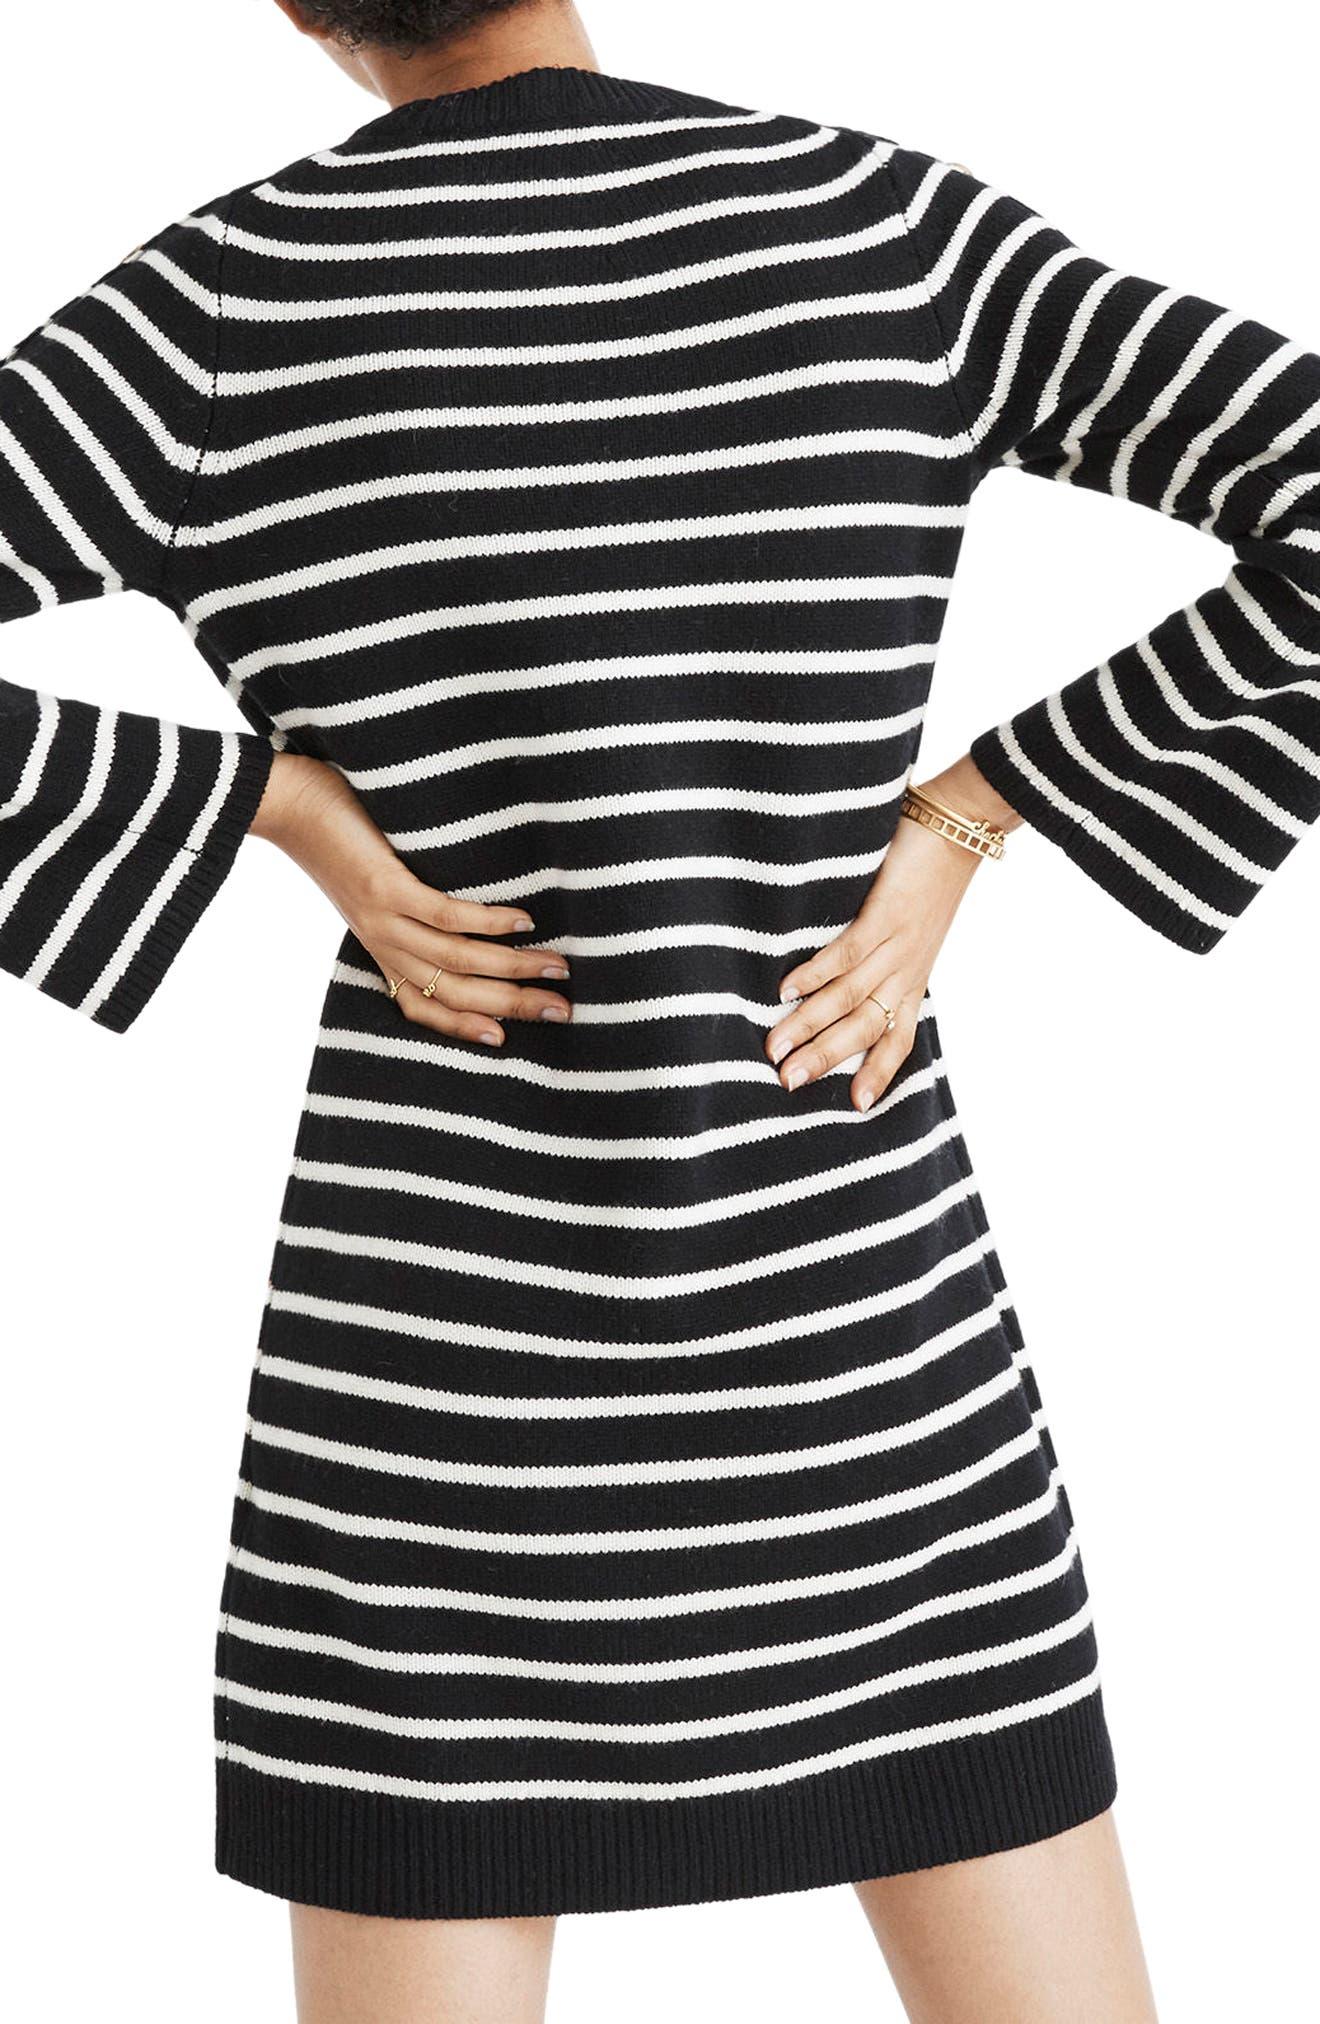 Stripe Sweater Dress,                             Alternate thumbnail 2, color,                             010